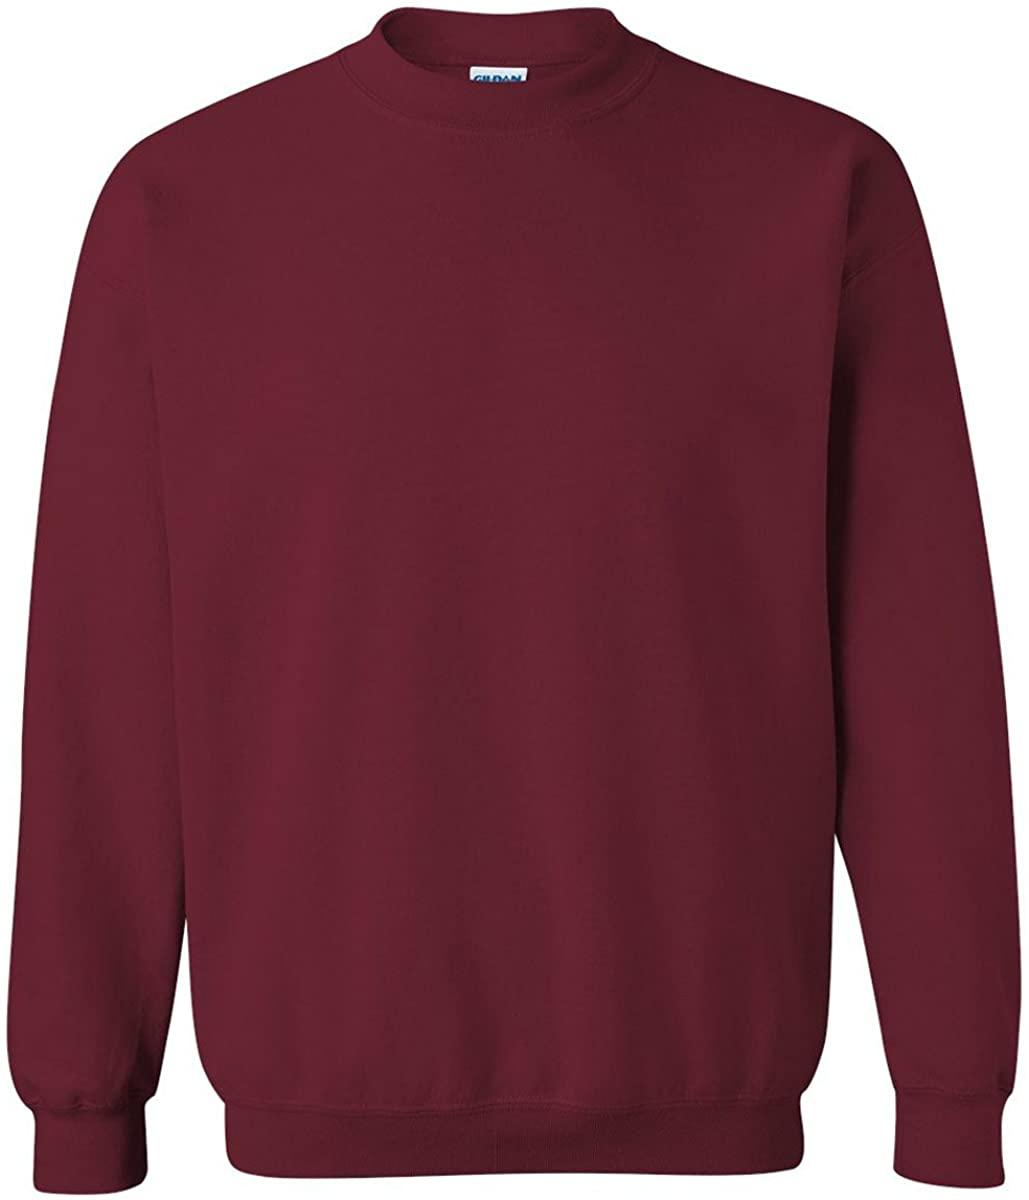 Gildan 18000 - Classic Fit Adult Crewneck Sweatshirt Heavy Blend - First Quality - Dark Chocolate - Large